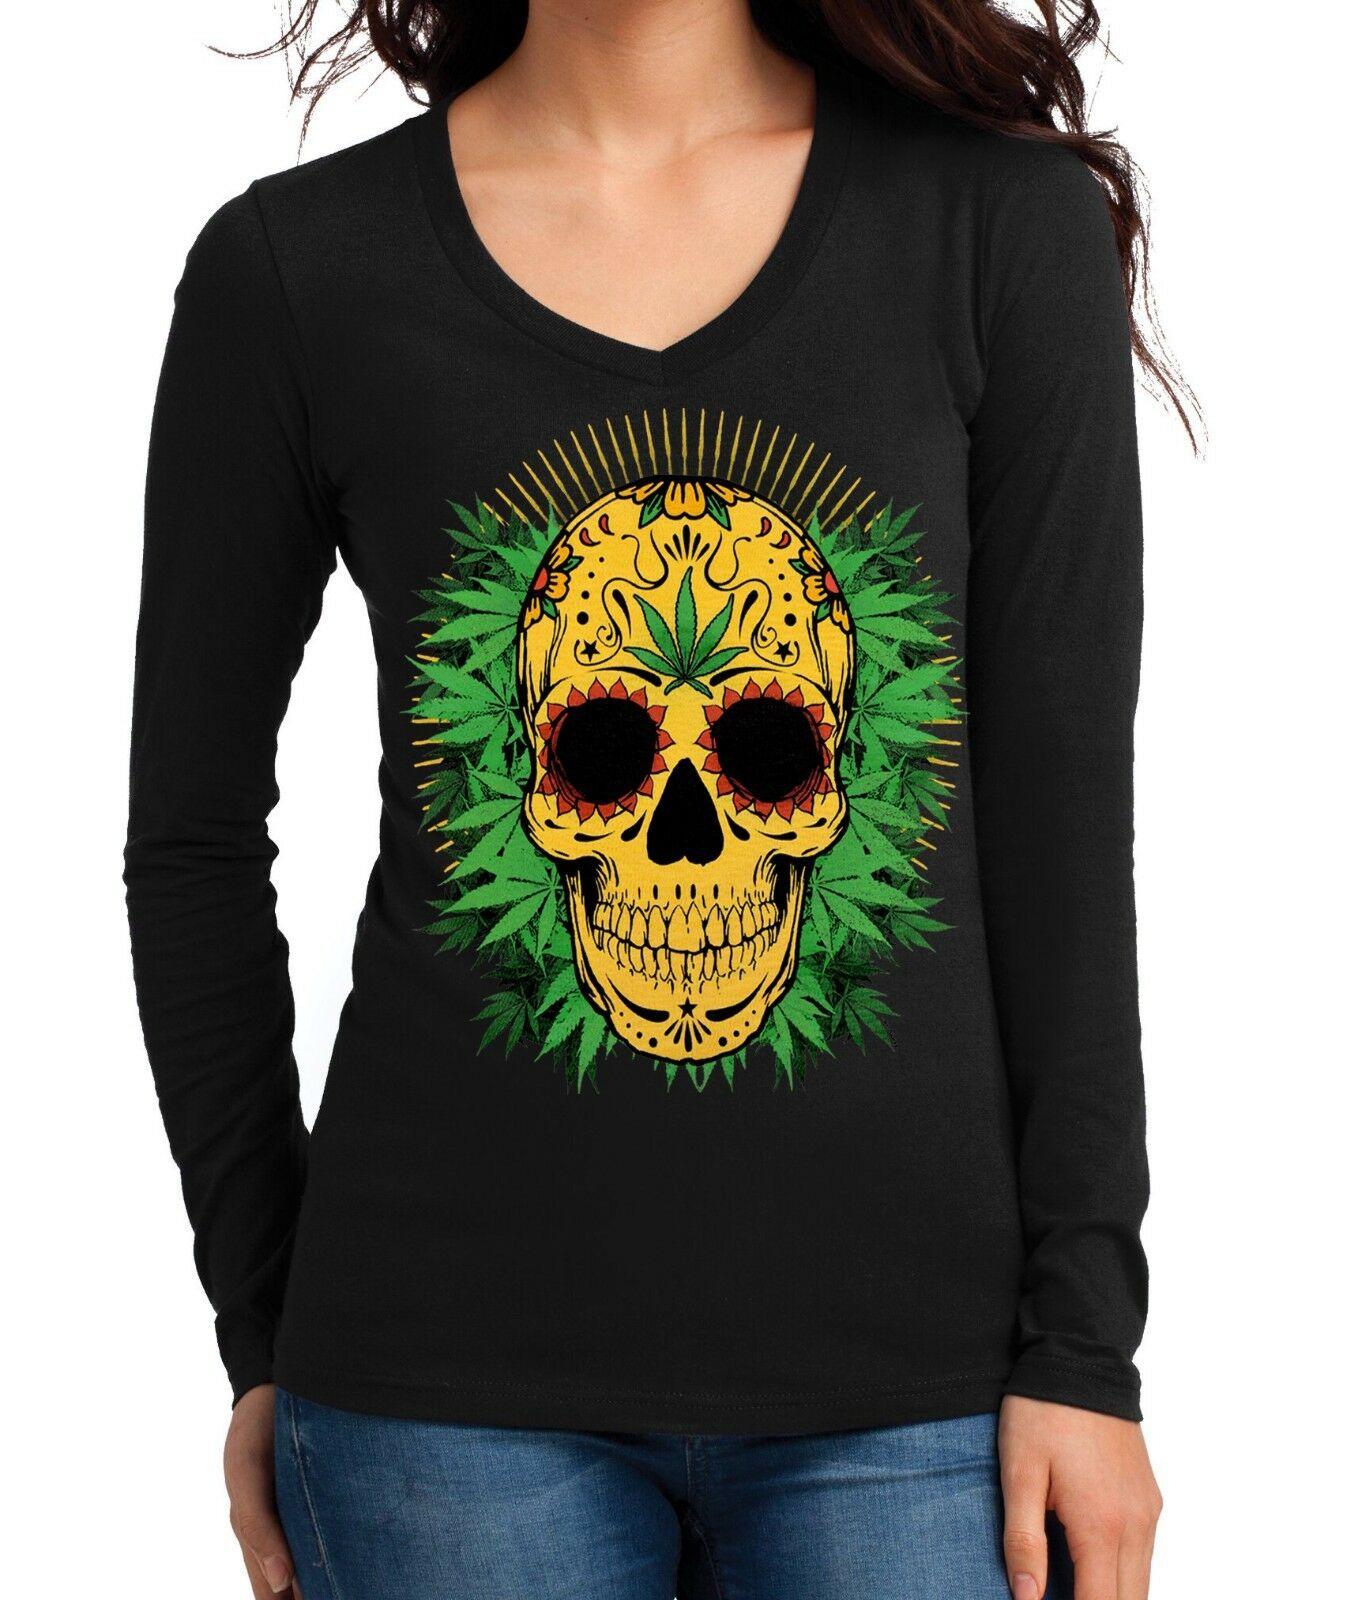 Yellow Weed Leaf Skull 420 Junior's V Neck Long Sleeve T Shirt Blunt Marijuana 1